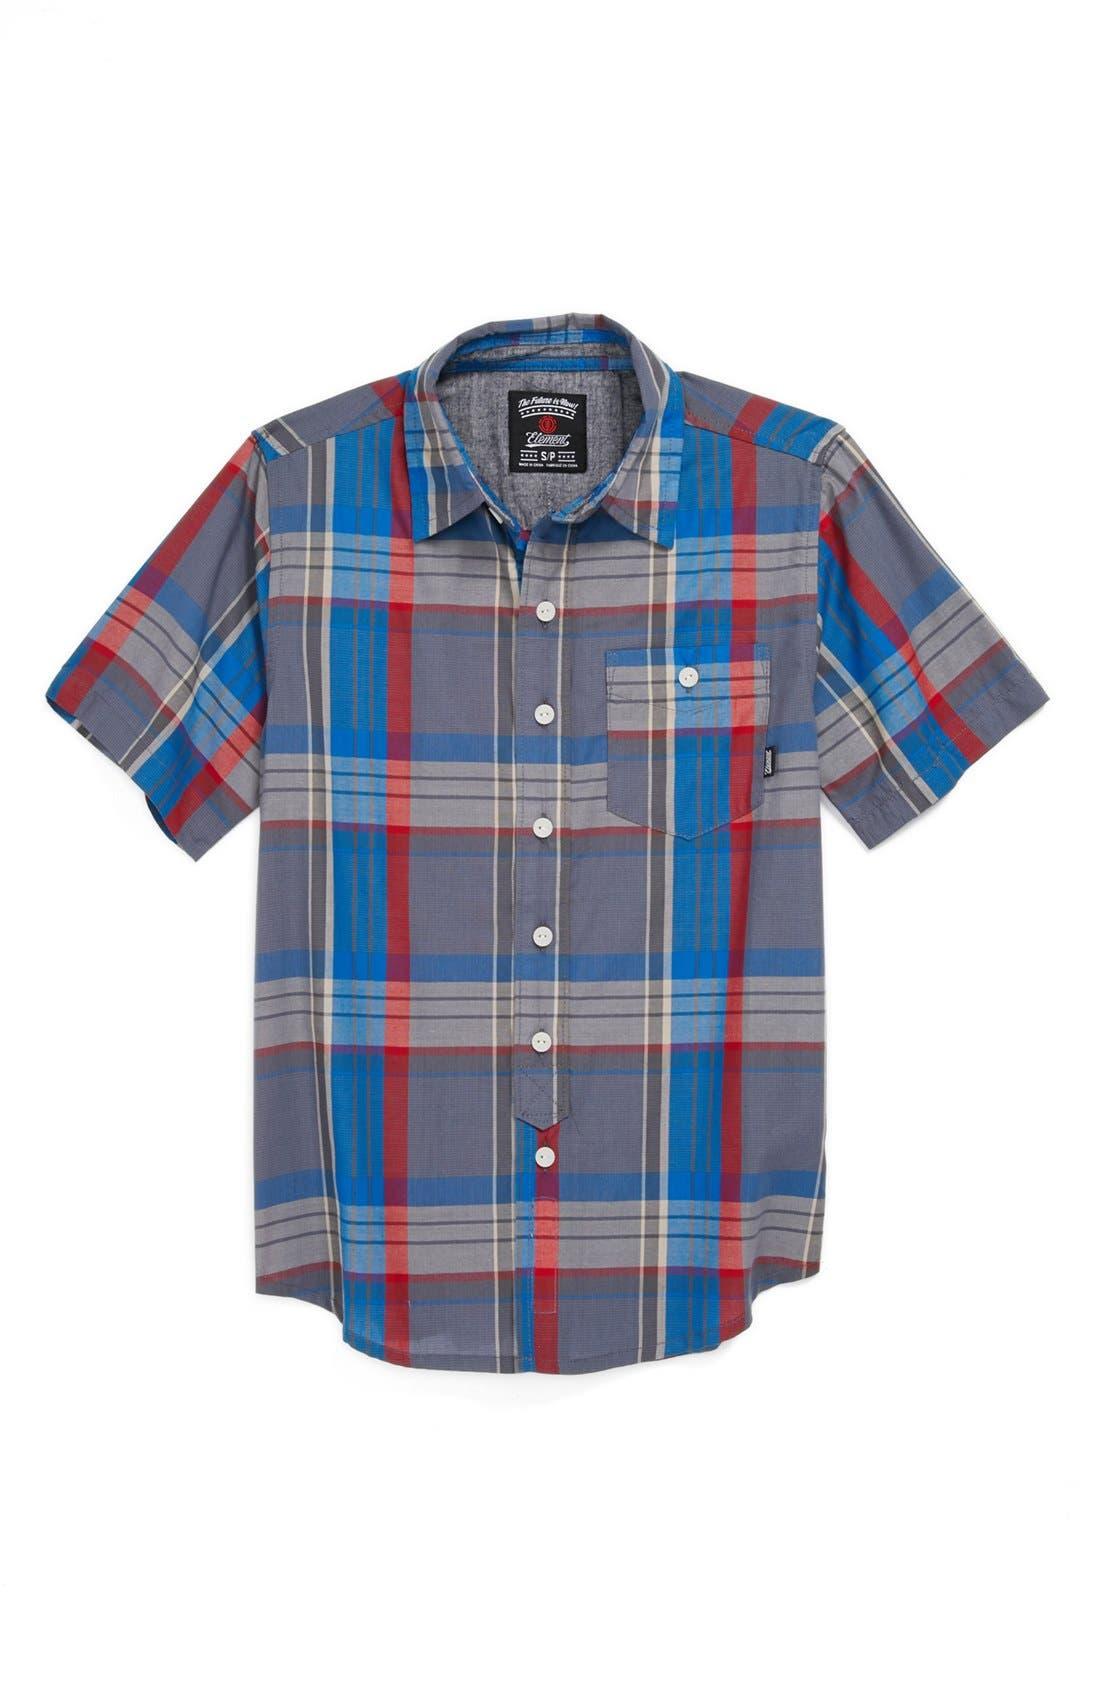 Alternate Image 1 Selected - Element 'Starsky' Woven Shirt (Big Boys)